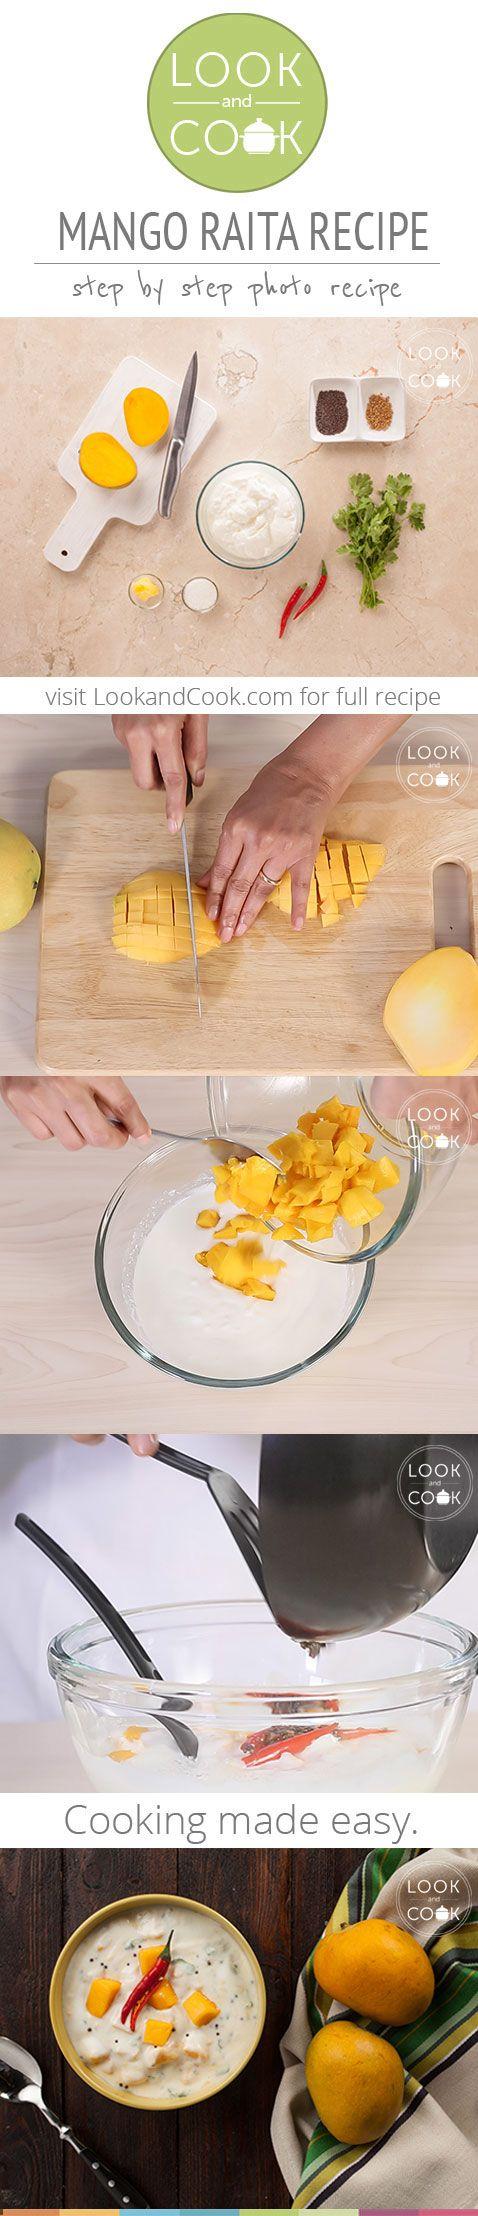 MANGO RAITA RECIPE (LC14296): Yogurt based condiment with chopped mangoes made often during the Mango season.